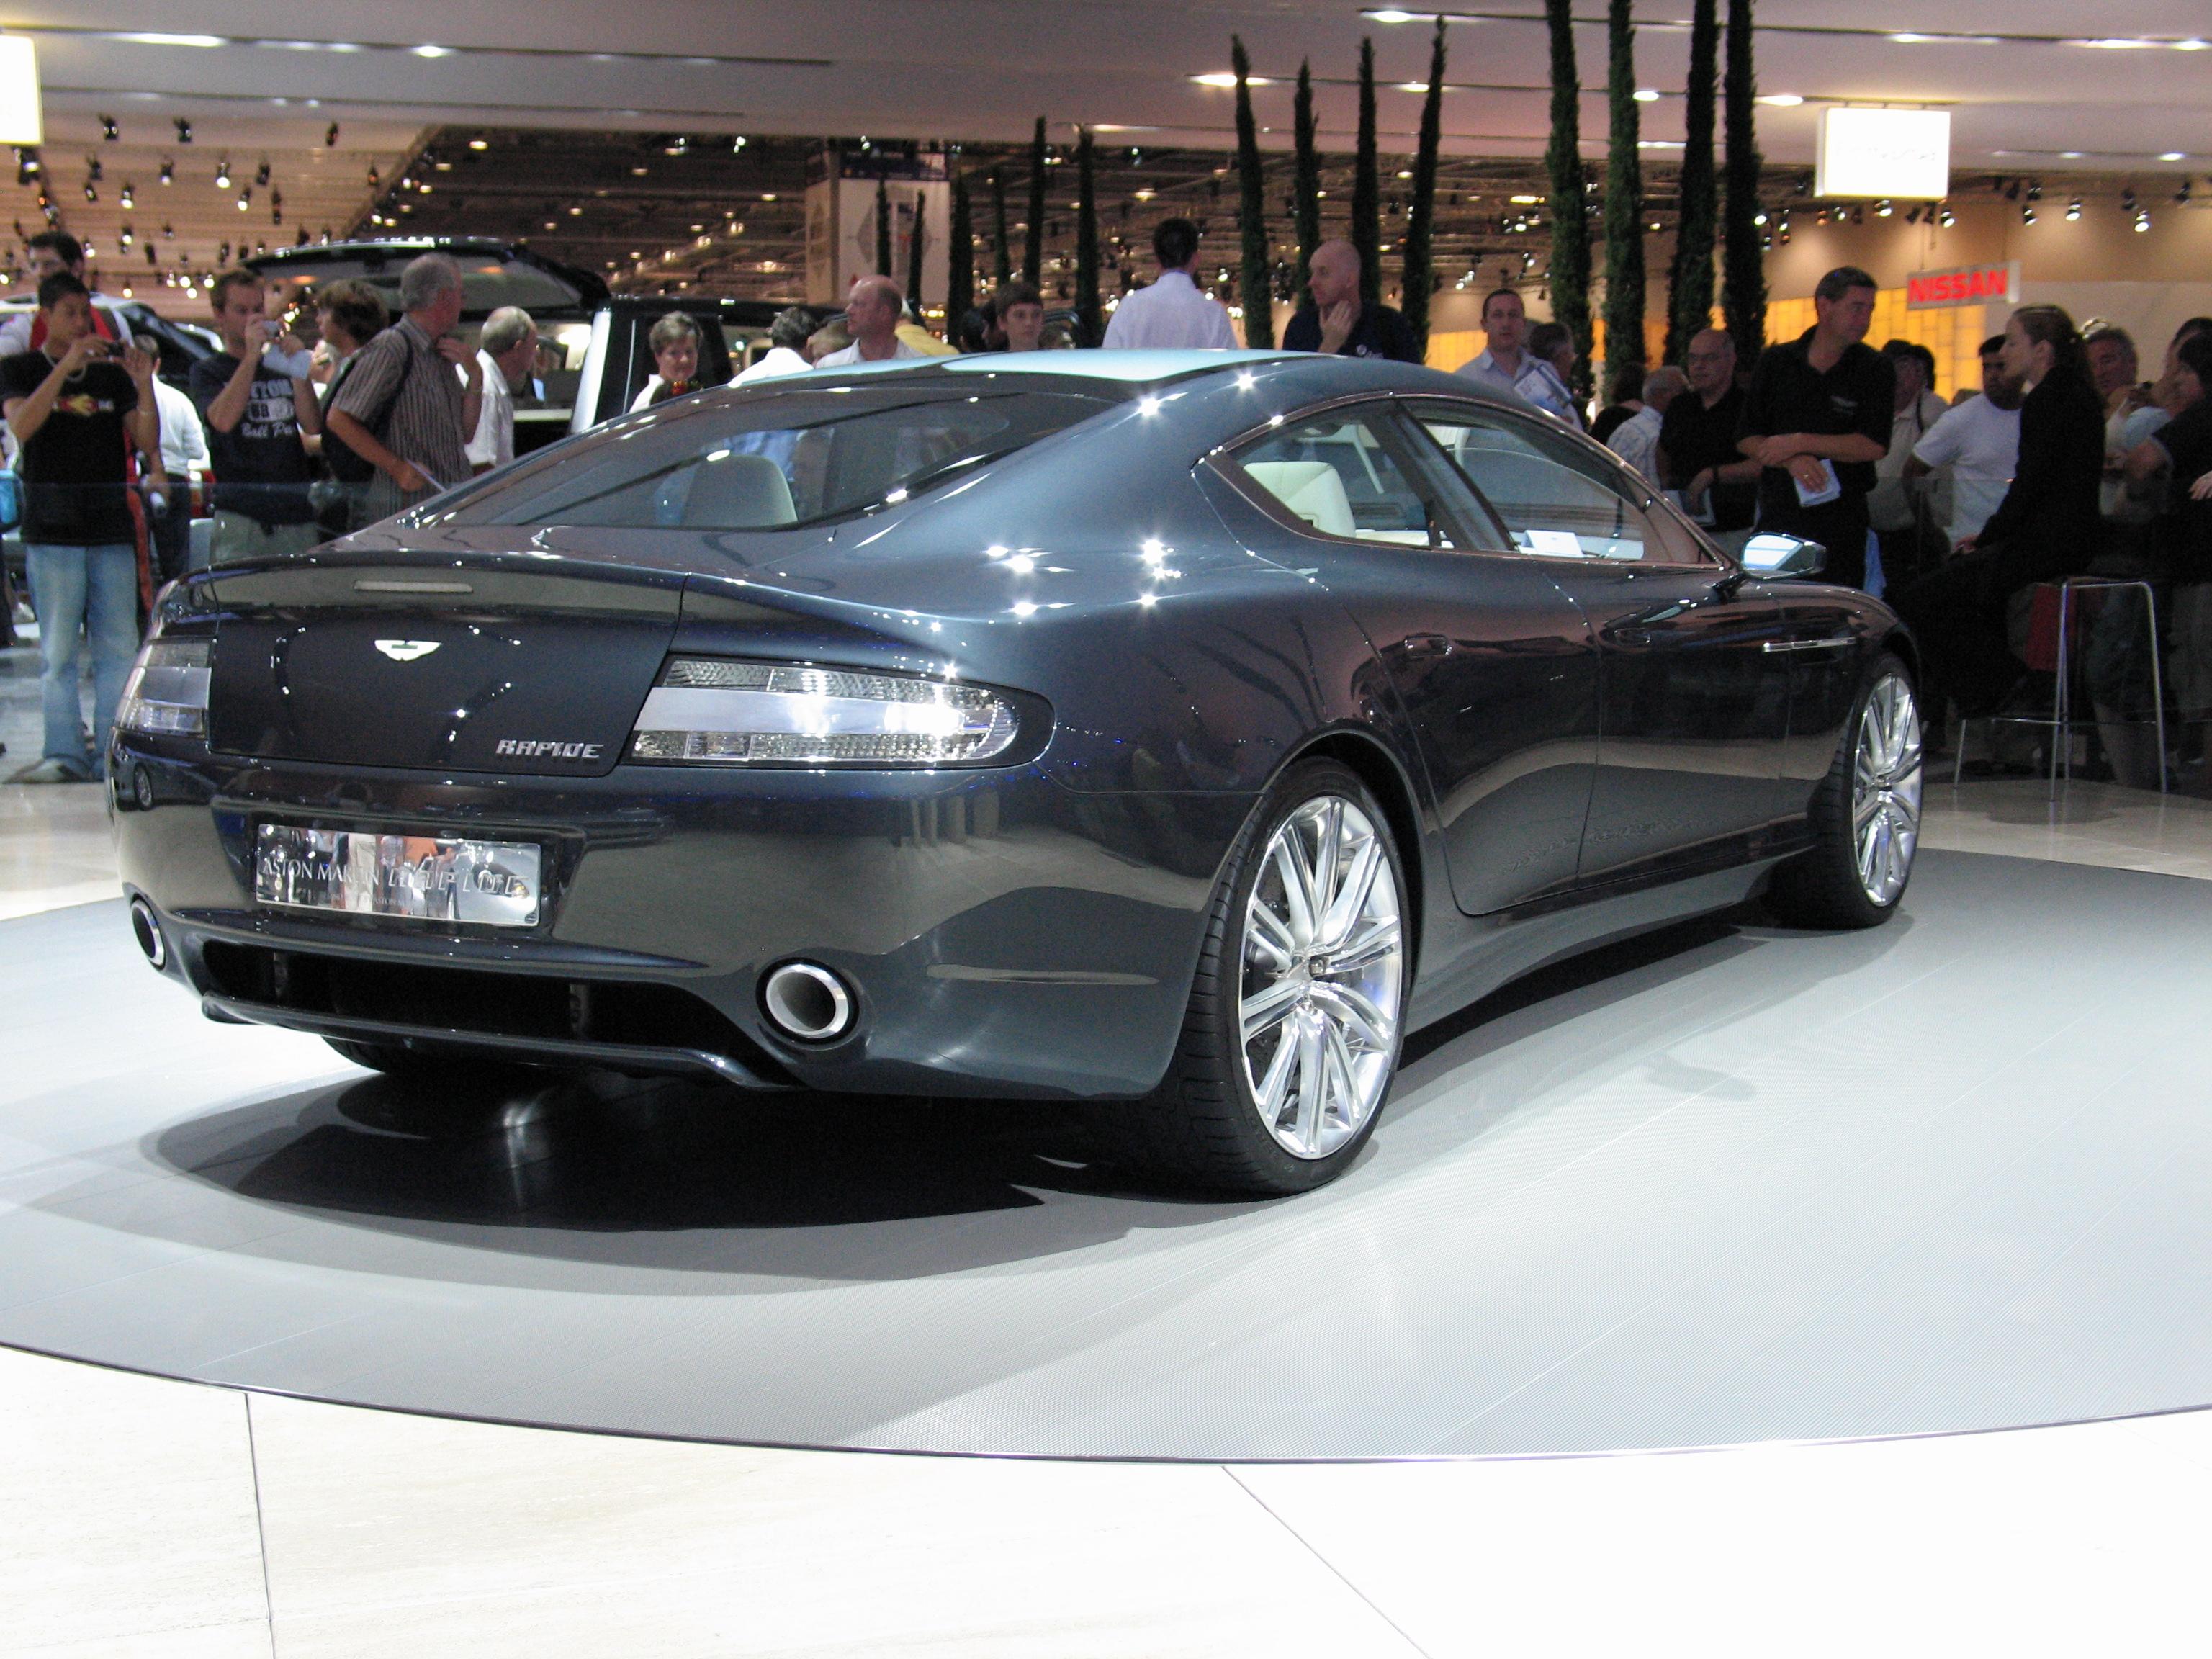 Datei:Aston Martin Rapide Concept - Flickr - cosmic spanner ... | aston martin rapide concept